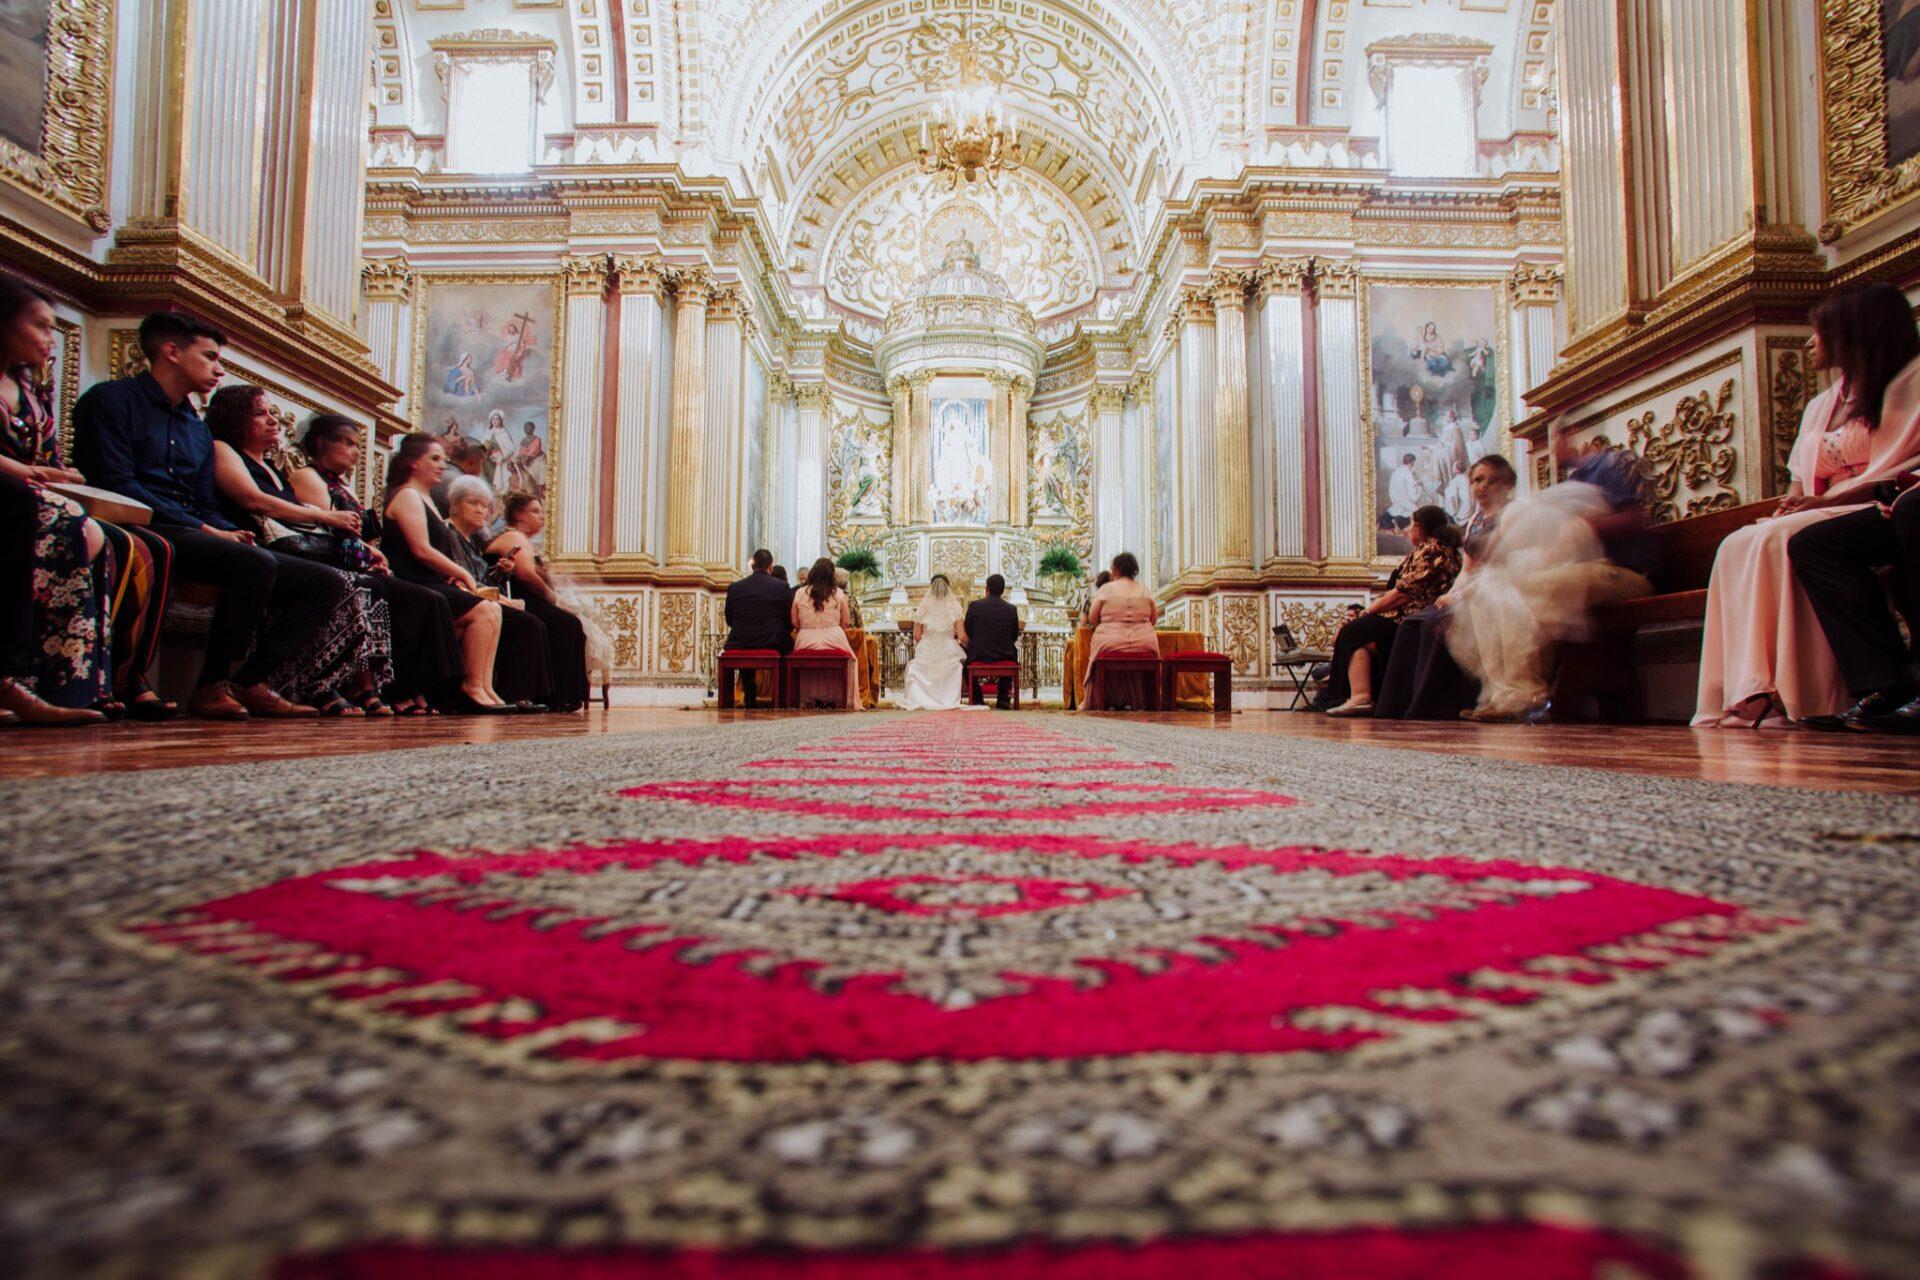 javier_noriega_fotografo_bodas_centro_platero_zacatecas_wedding_photographer9